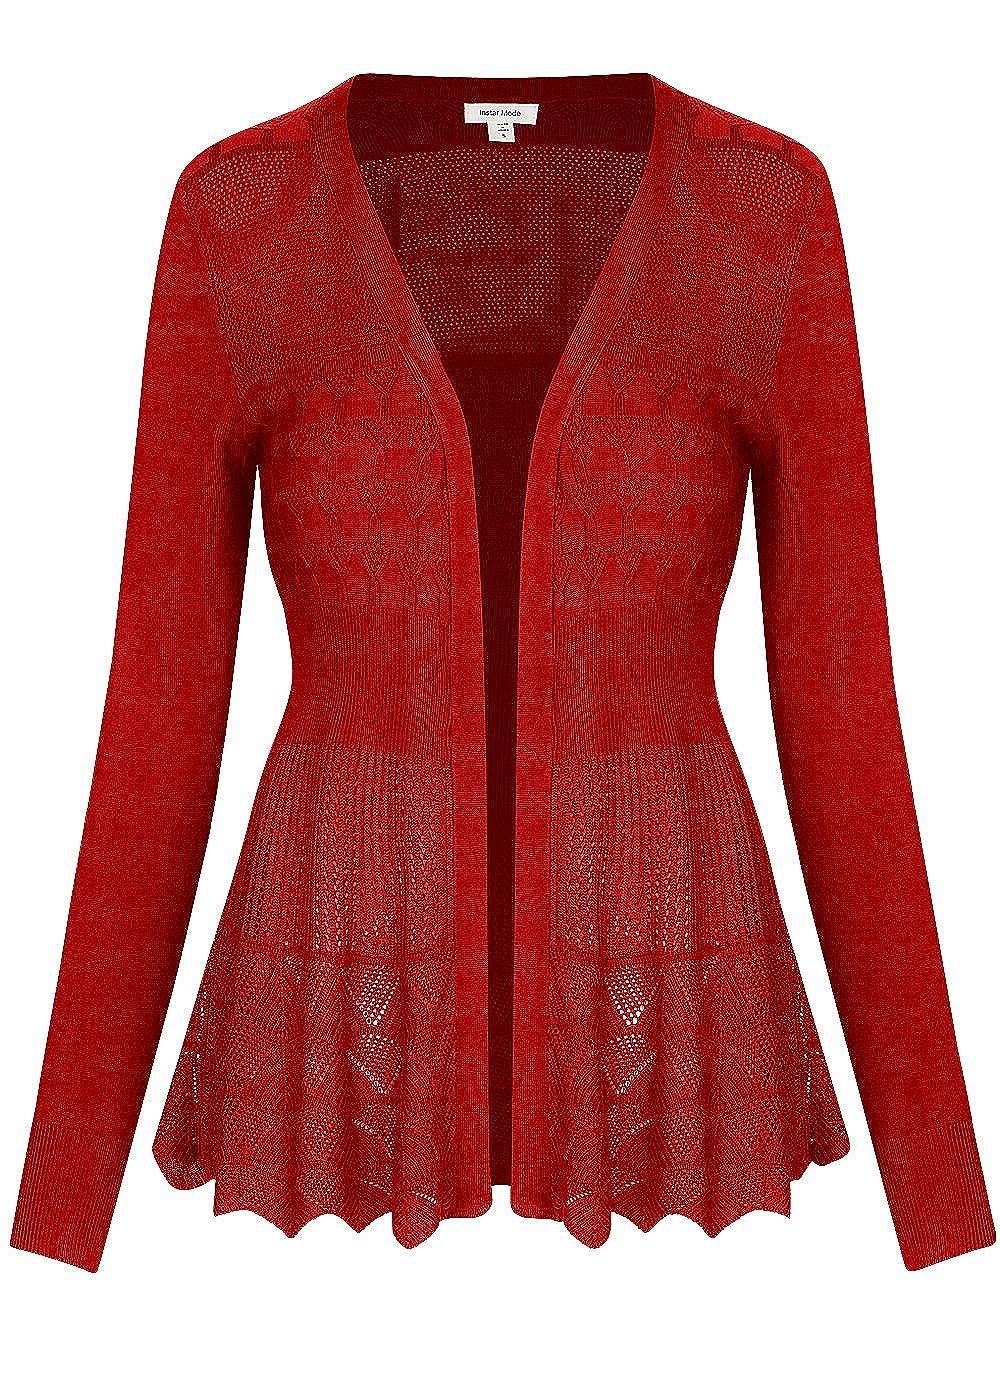 C09115 Red Instar Mode InstarMode Women's Long Sleeve Crochet Knit Sweater Draped Open Cardigan